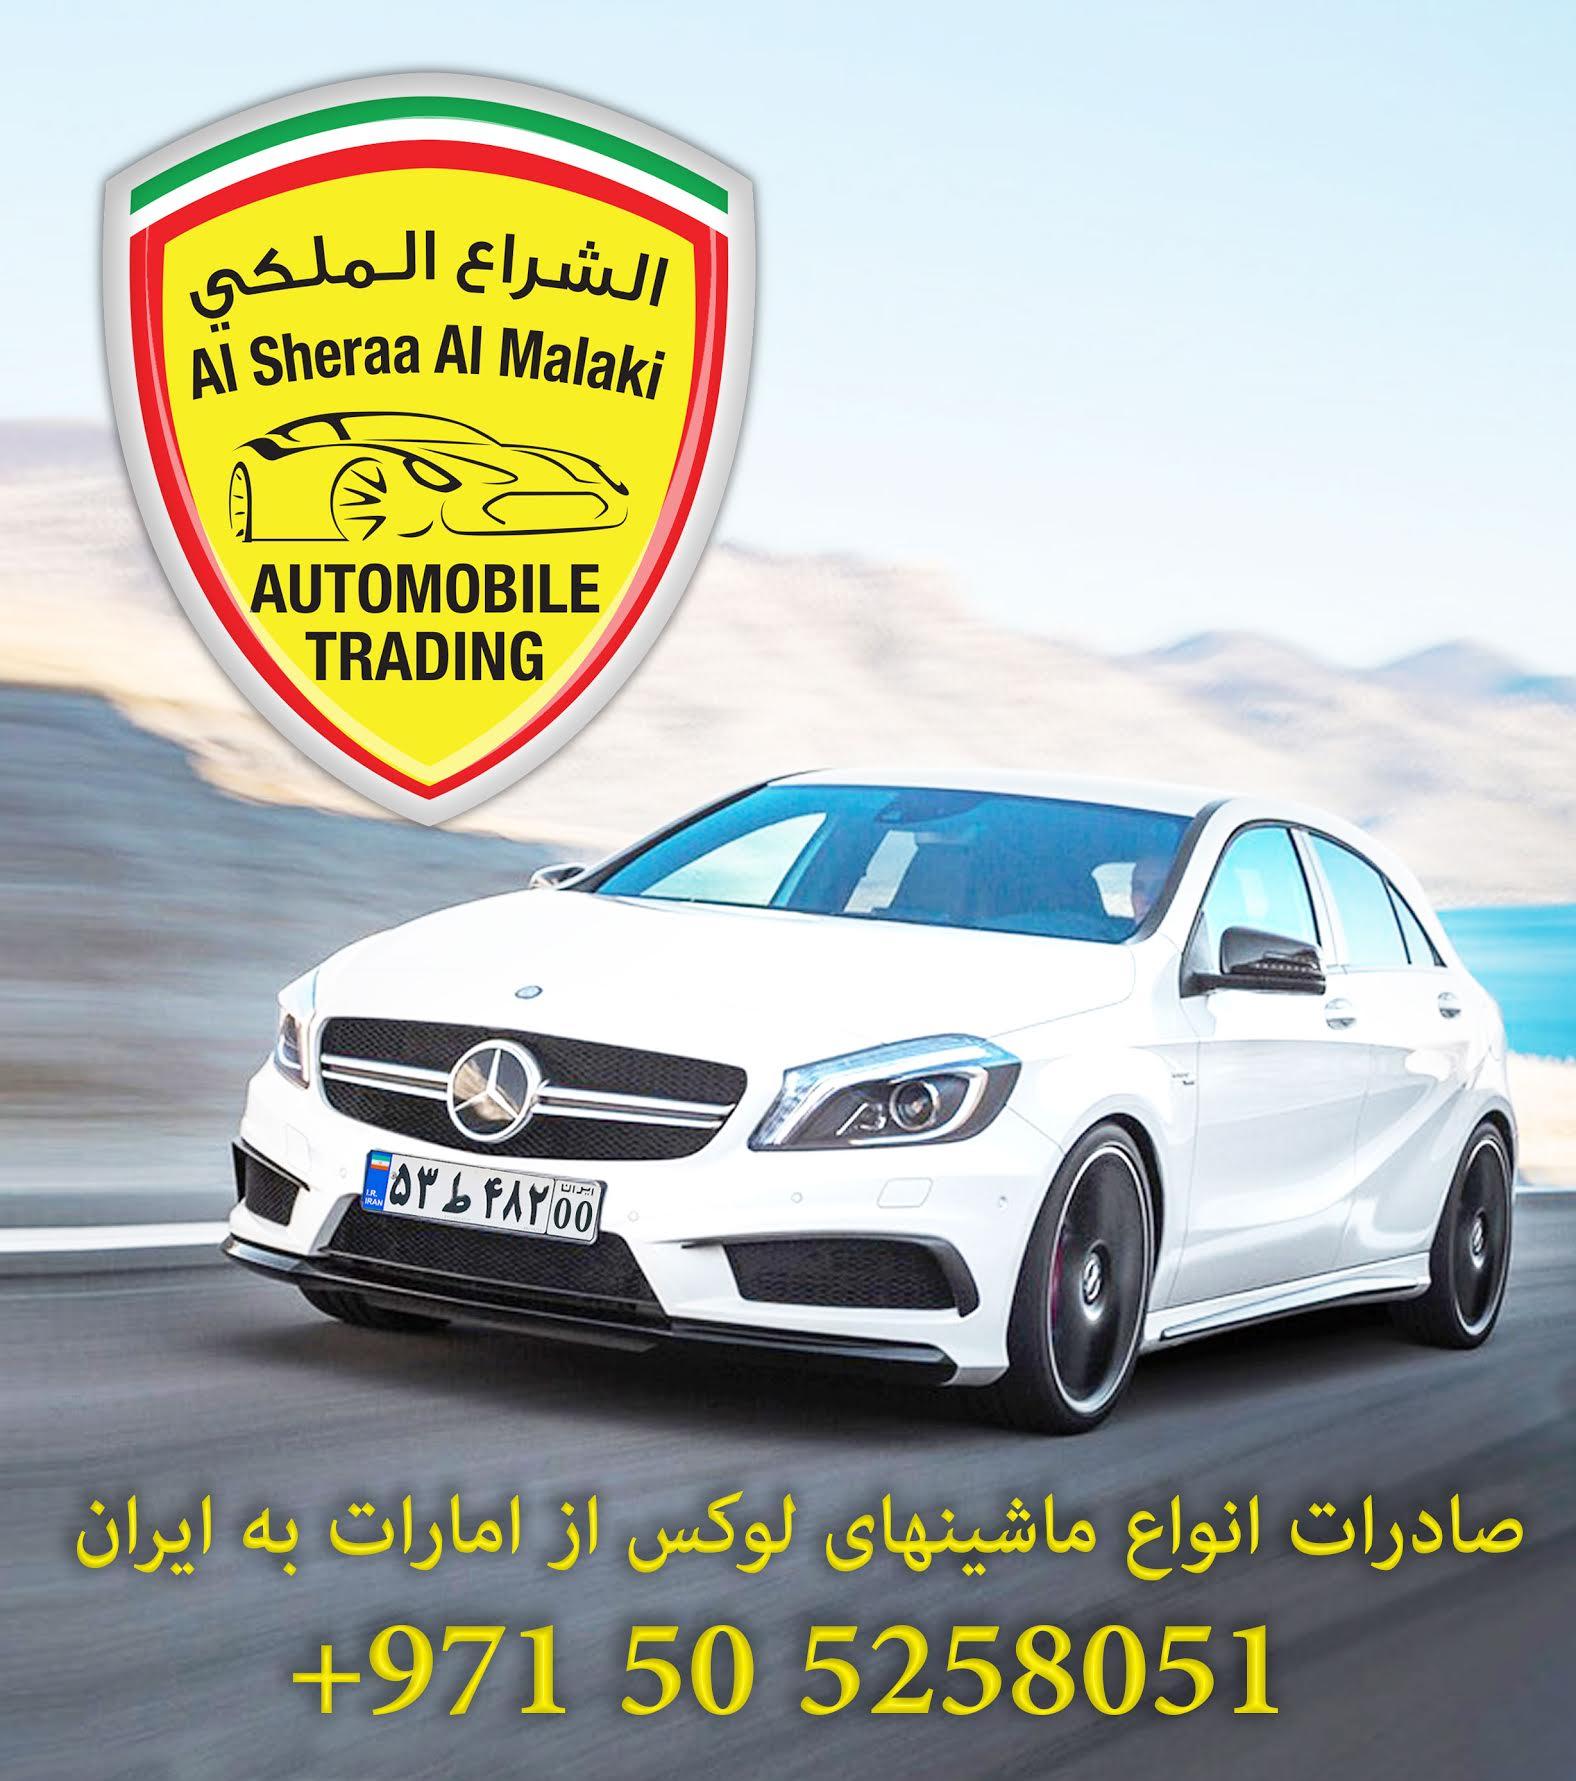 کانال تلگرام   پایگاه تخصصی فوتبال بوشهر